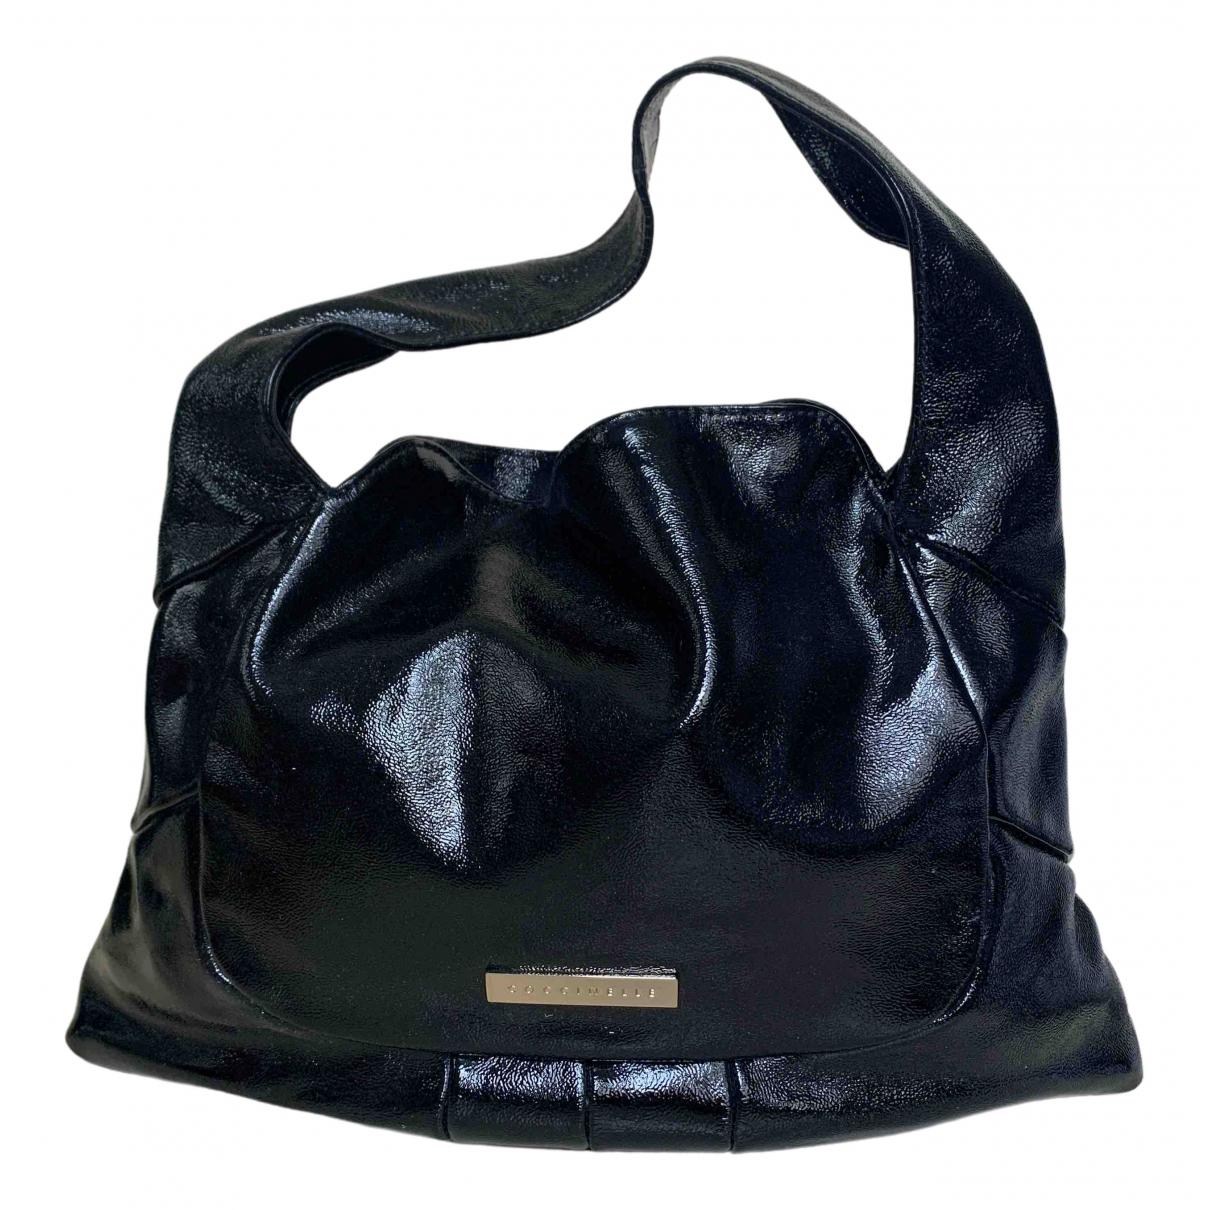 Coccinelle \N Black Patent leather handbag for Women \N